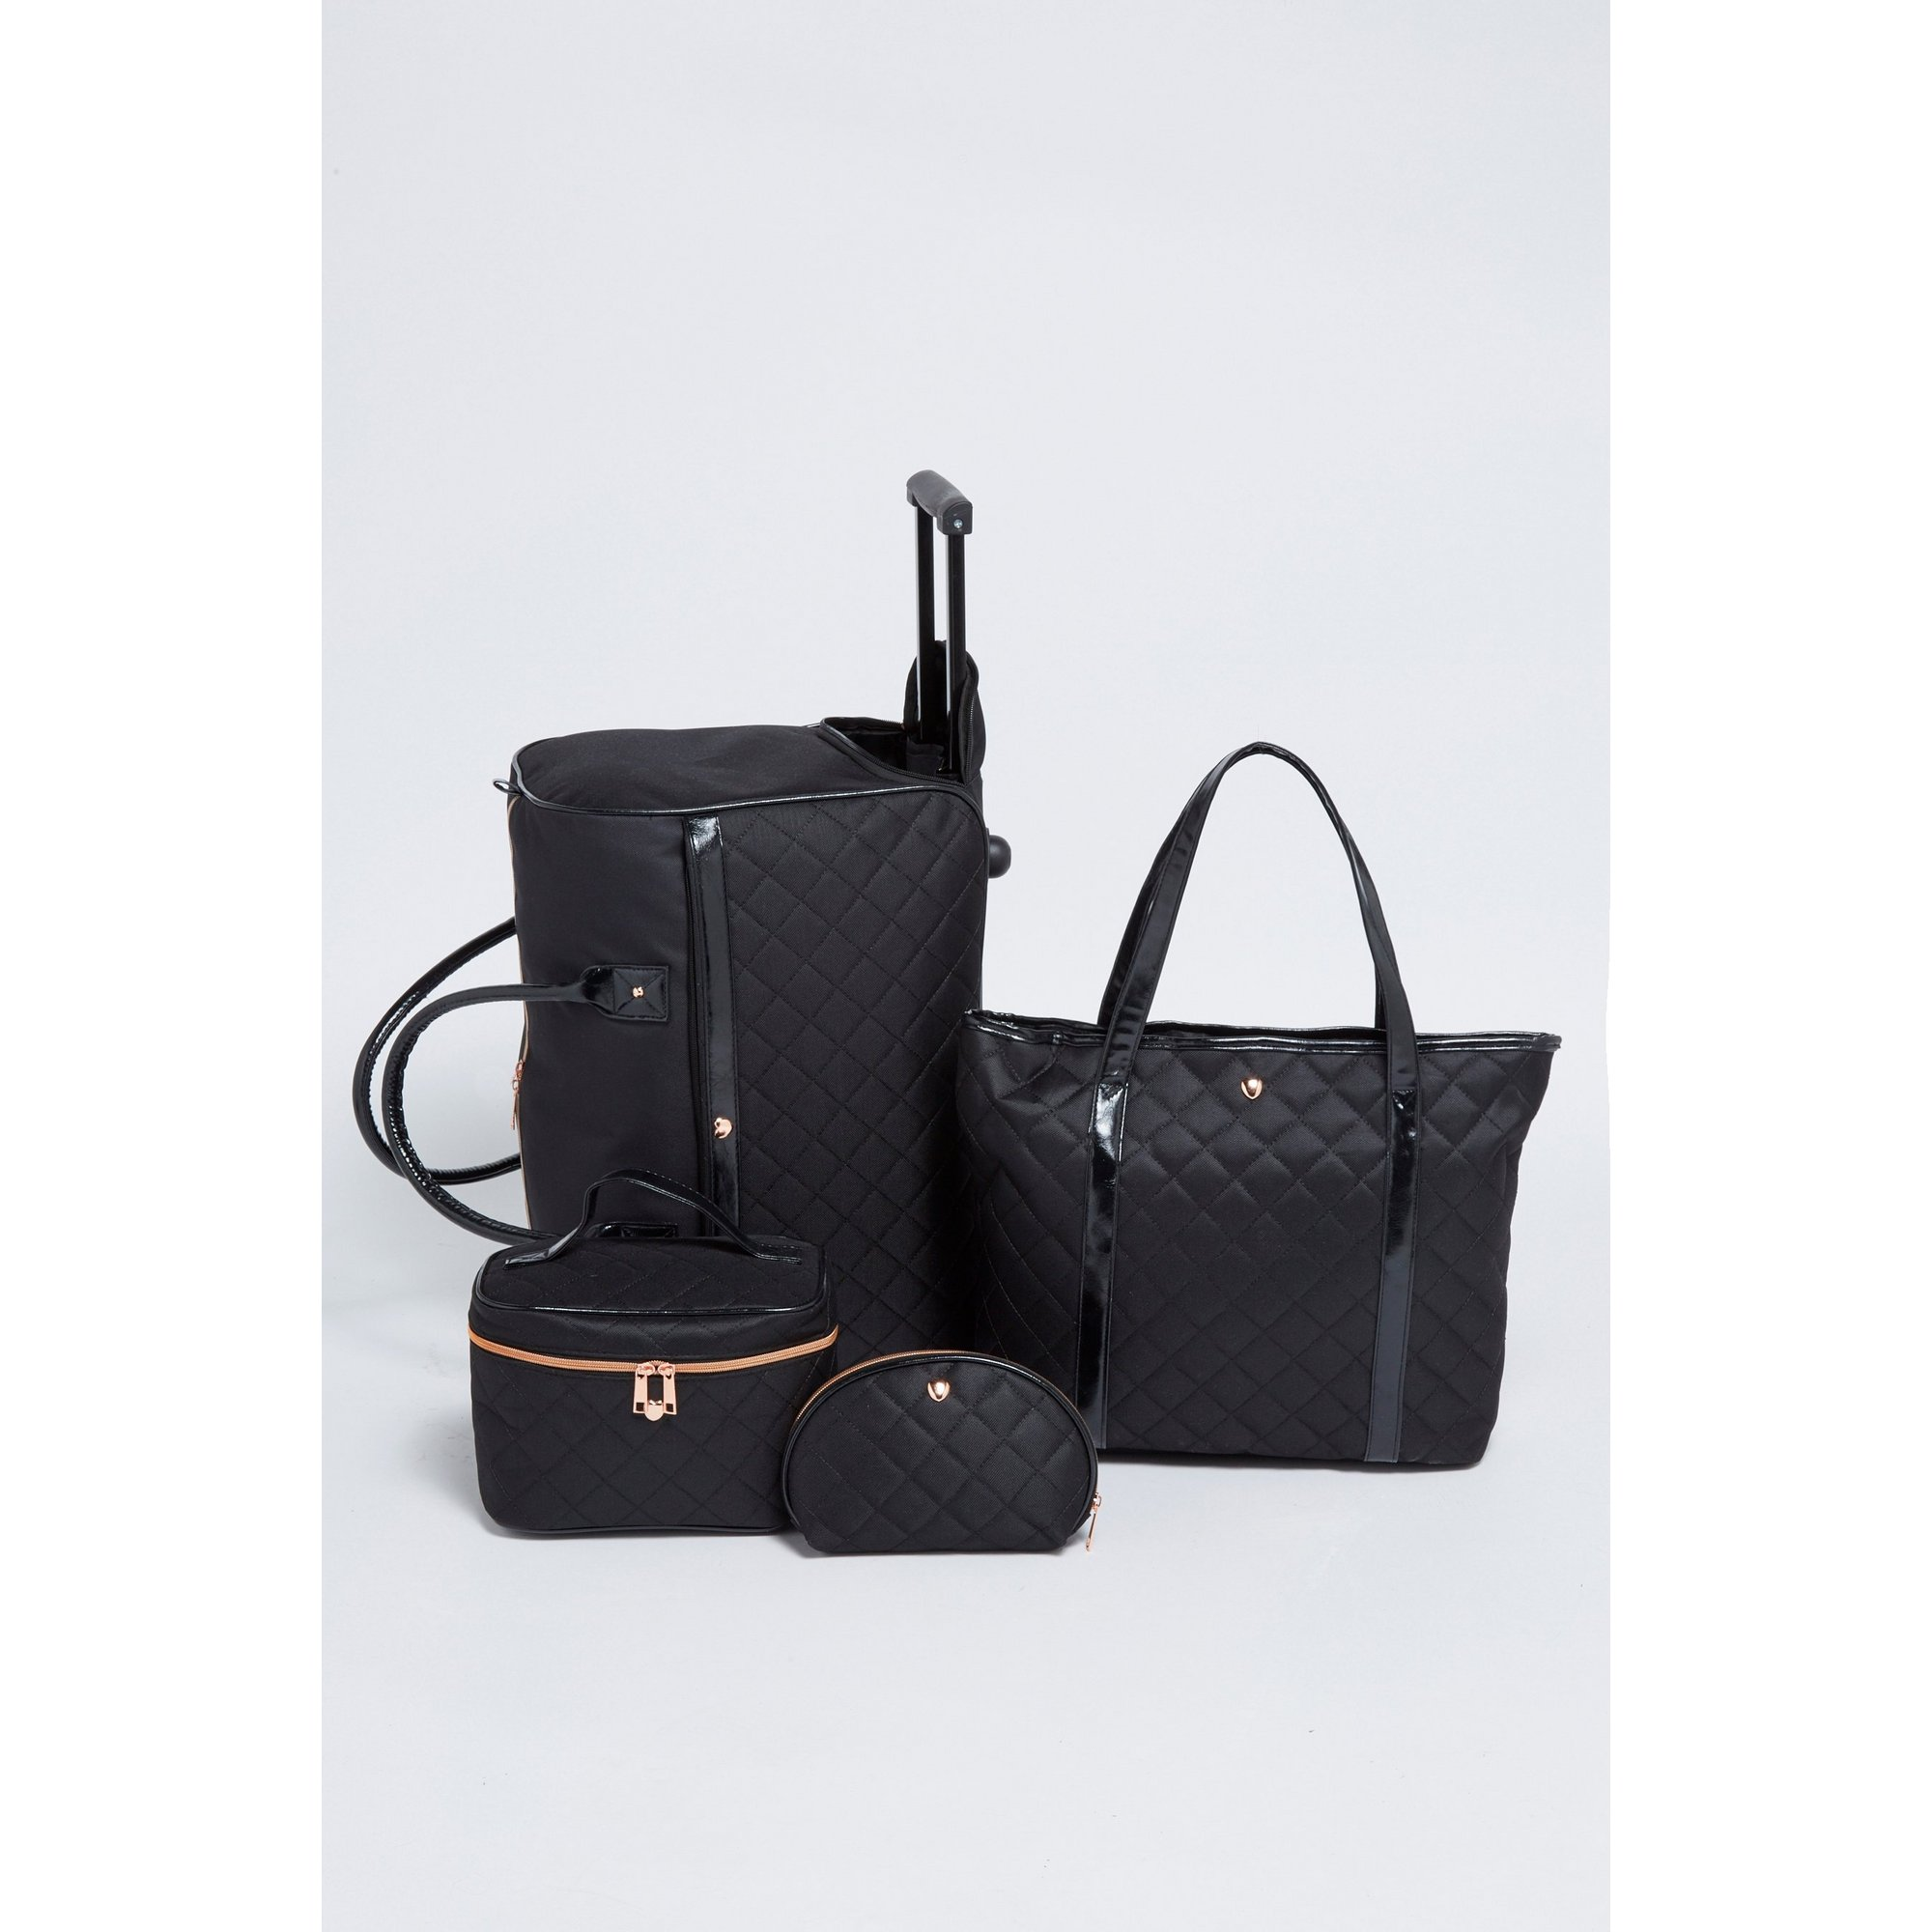 Image of Black Quilted 4-Piece Bag Set